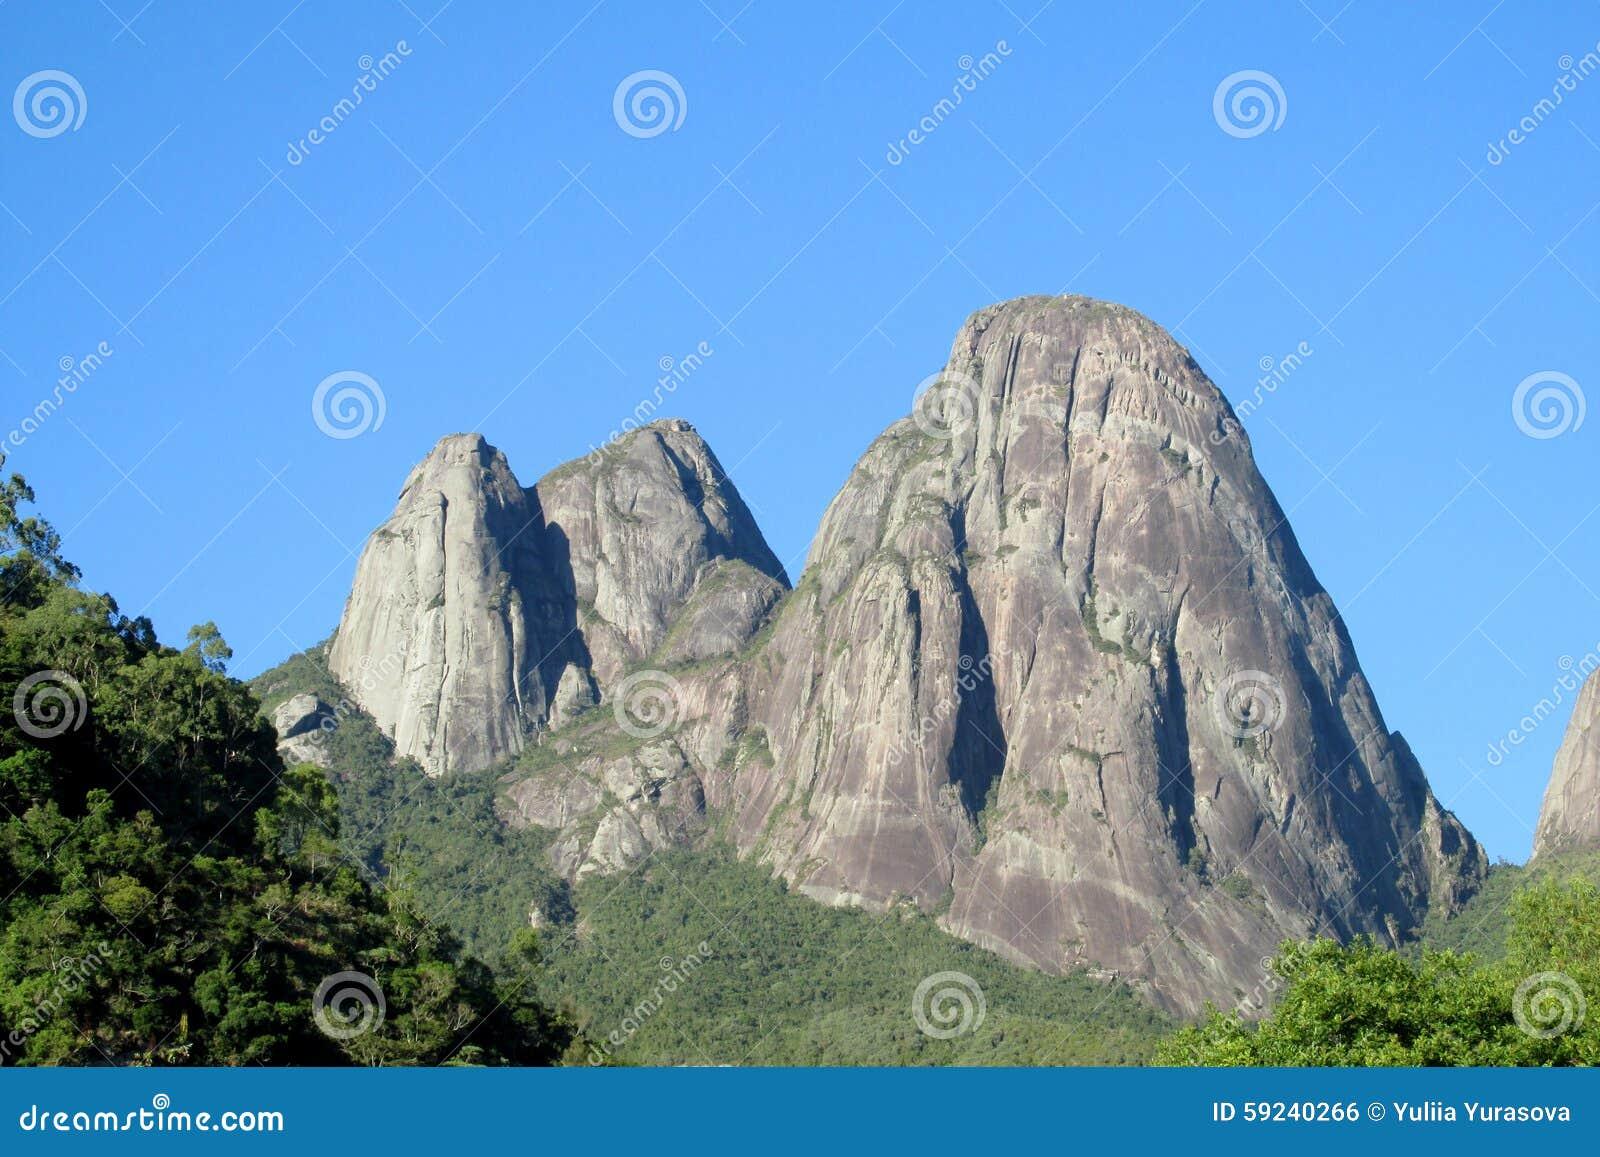 Download Roca Lisa Hermosa En Bosque Verde Foto de archivo - Imagen de américa, alpestre: 59240266